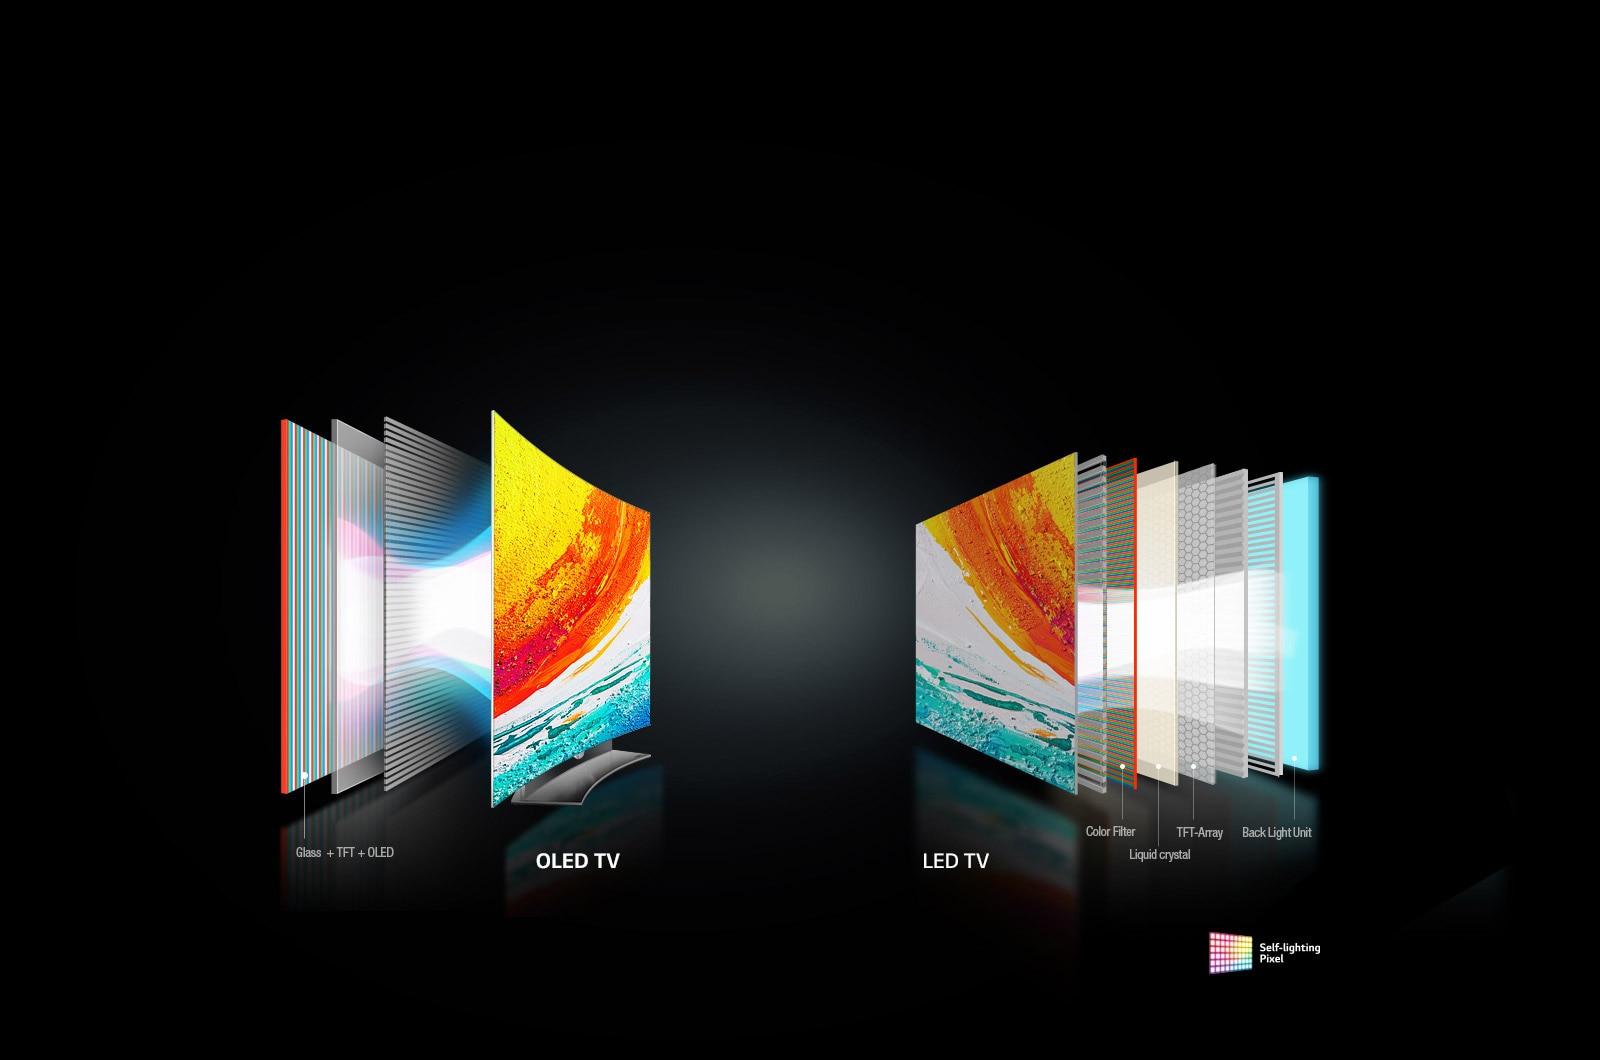 Self-lighting Pixels